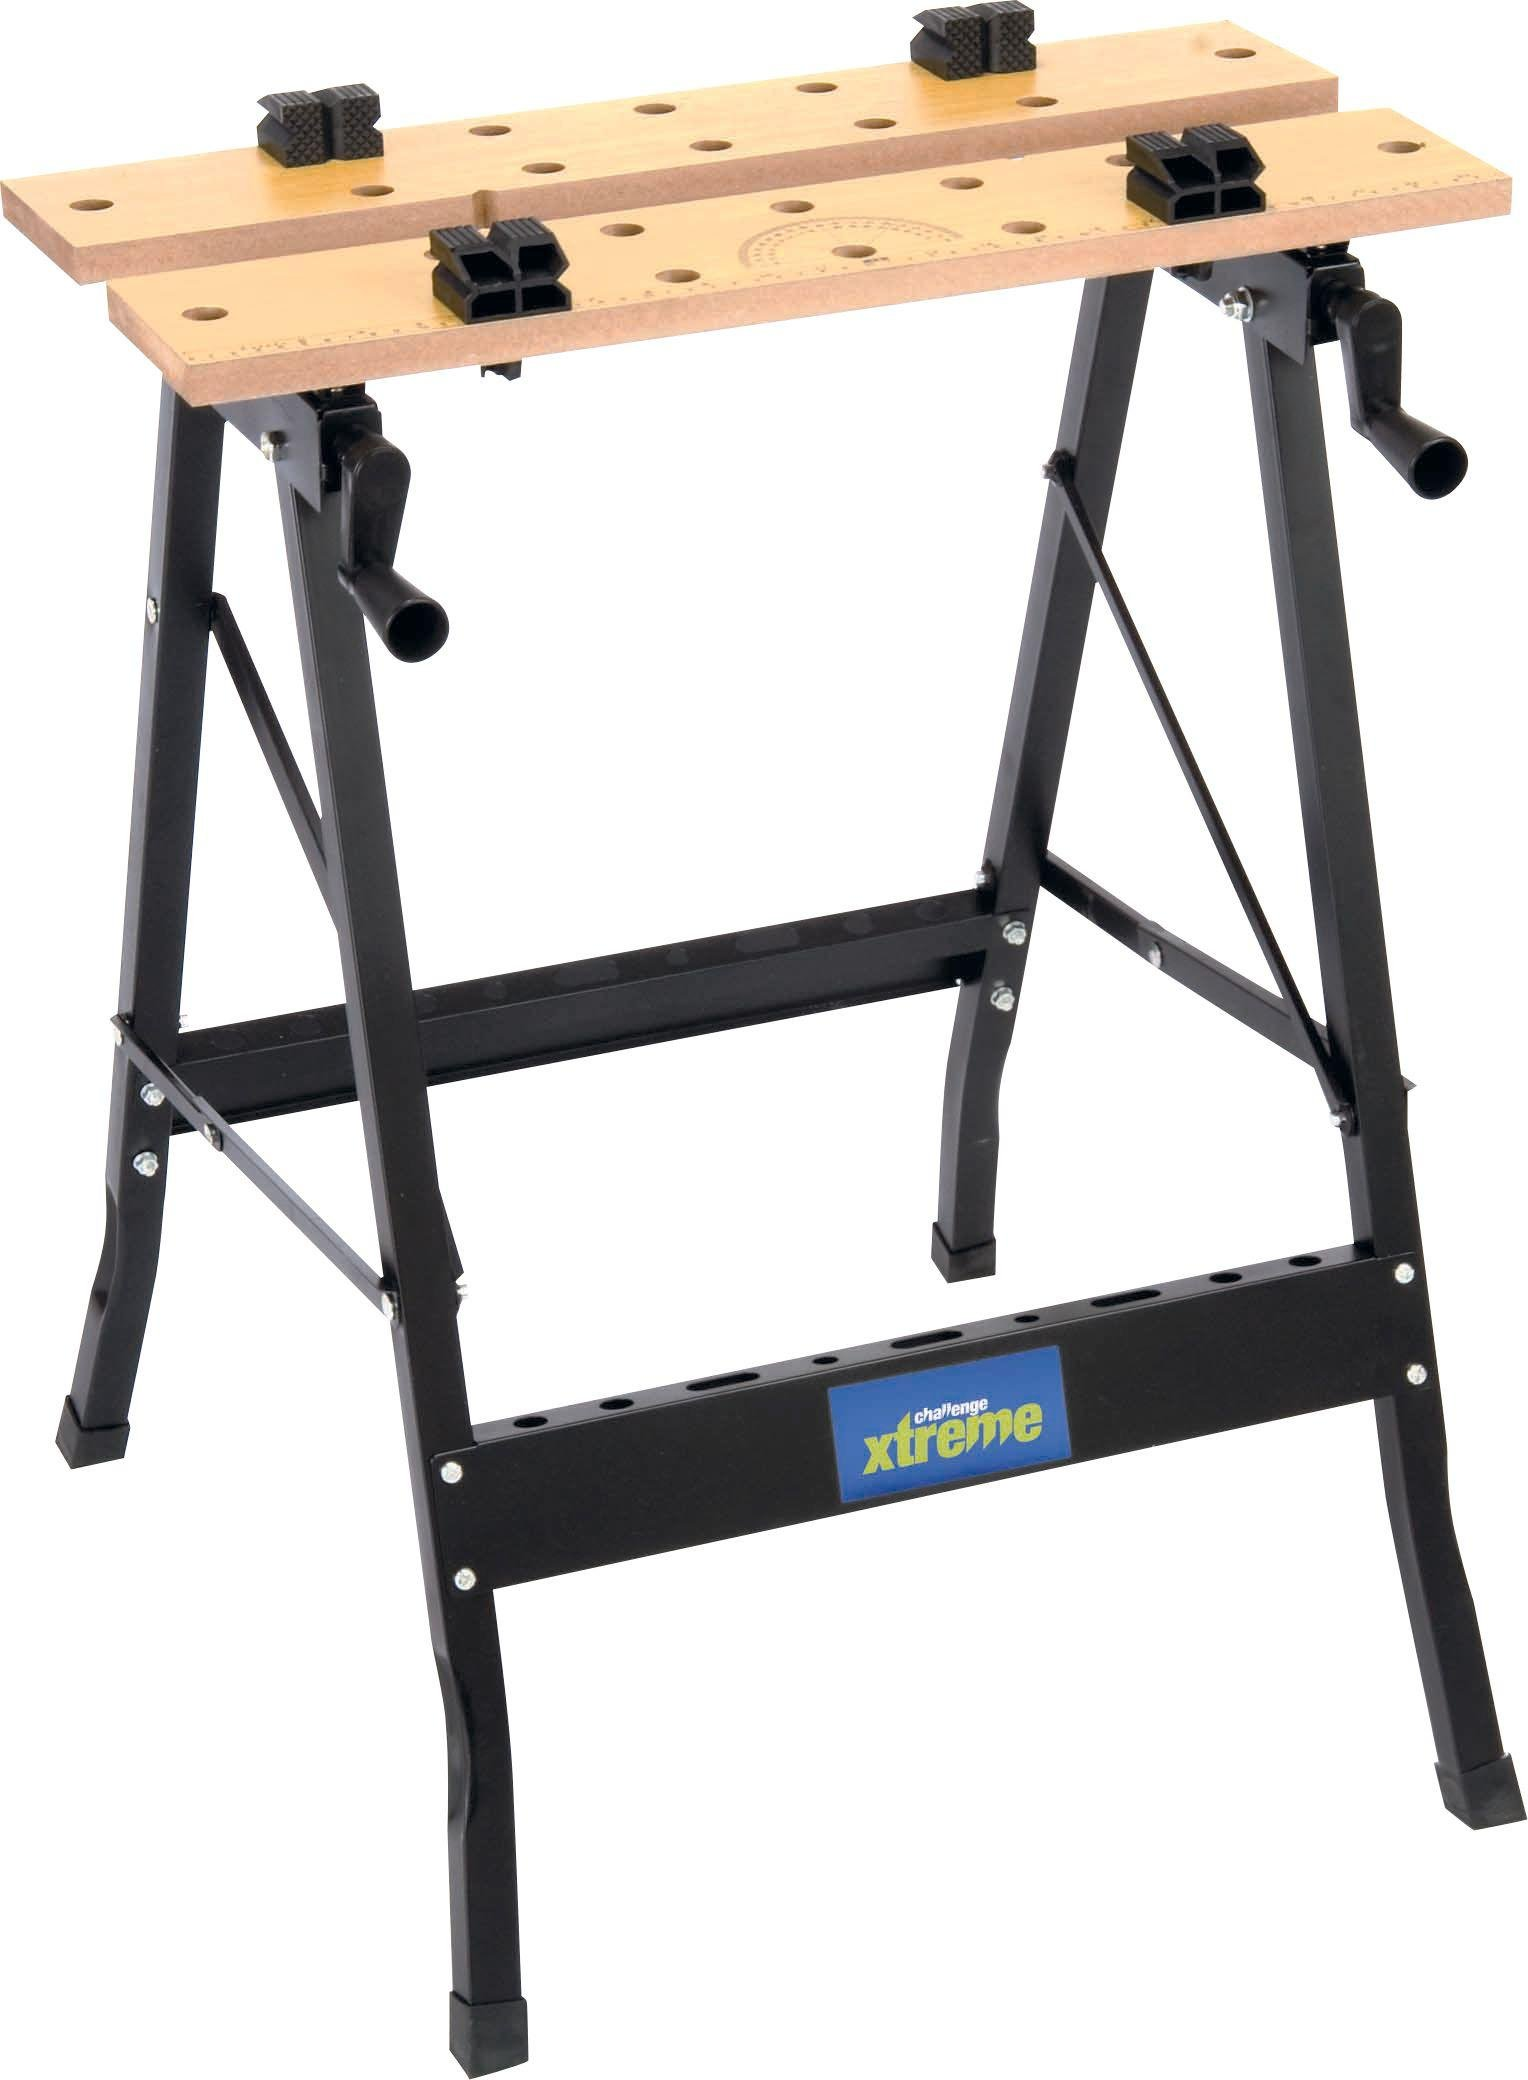 Folding table keter - Keter Folding Work Bench Table